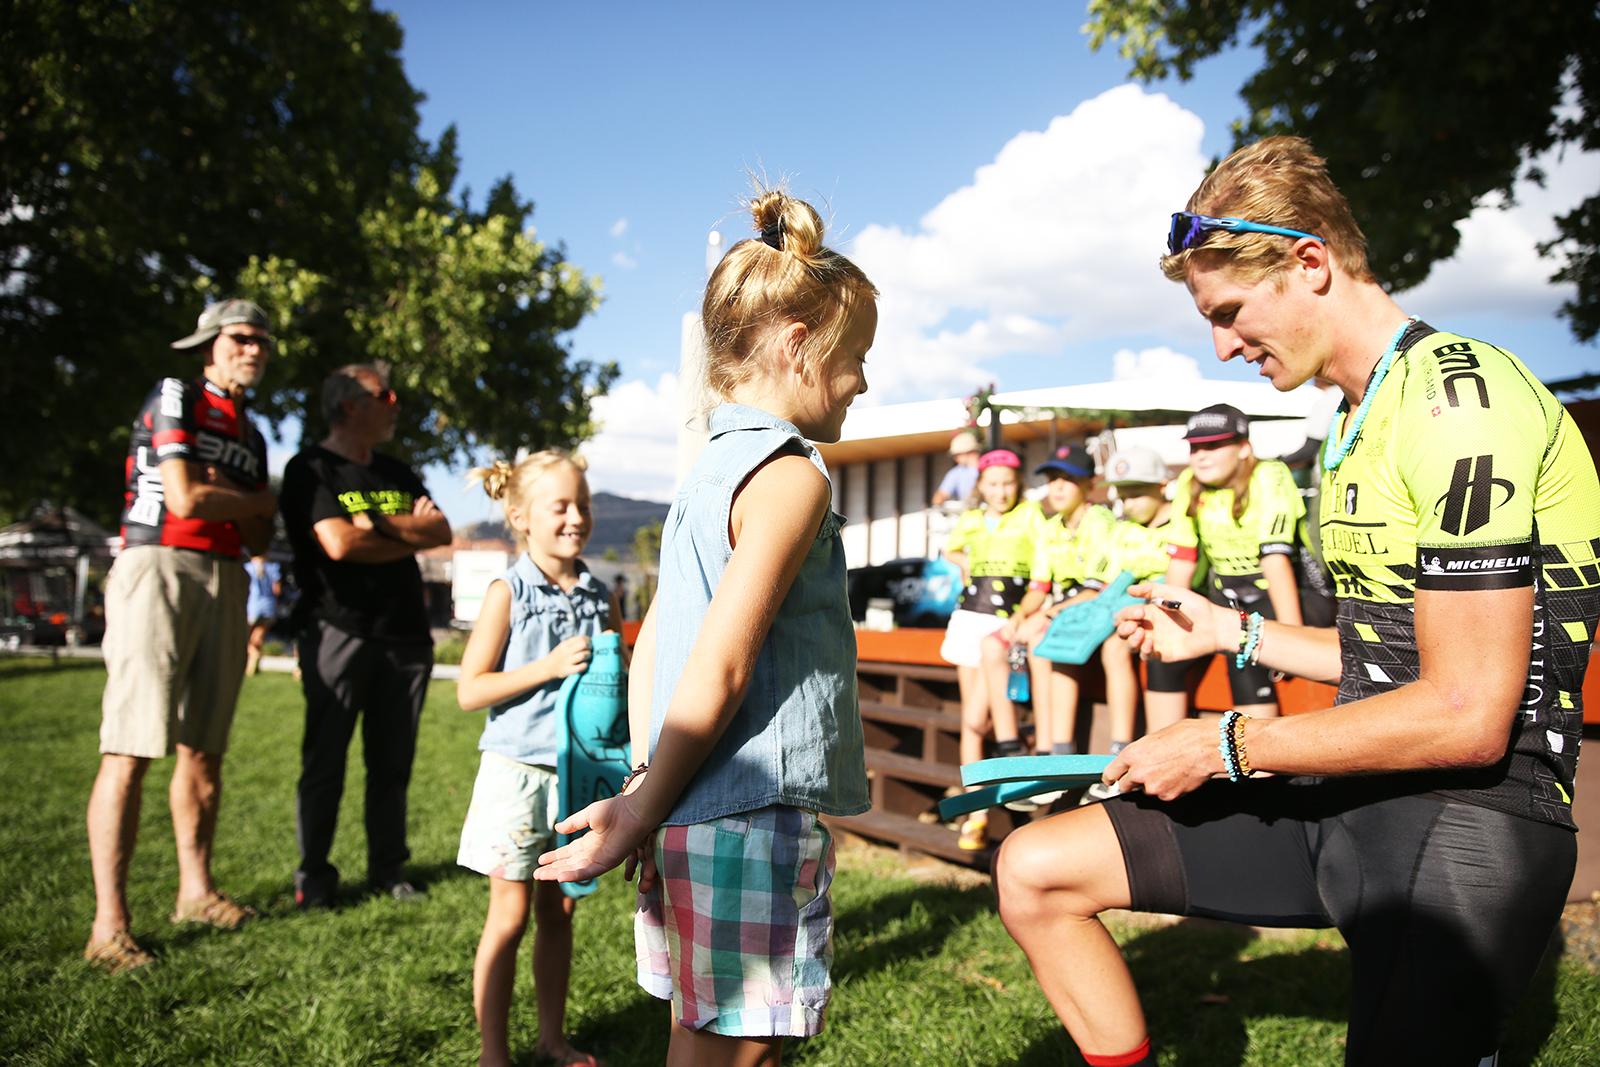 Mini fans. 2018 Tour of Utah Team Presentation, August 4, 2018, Cedar City, Utah. Photo by Cathy Fegan-Kim, cottonsoxphotography.net